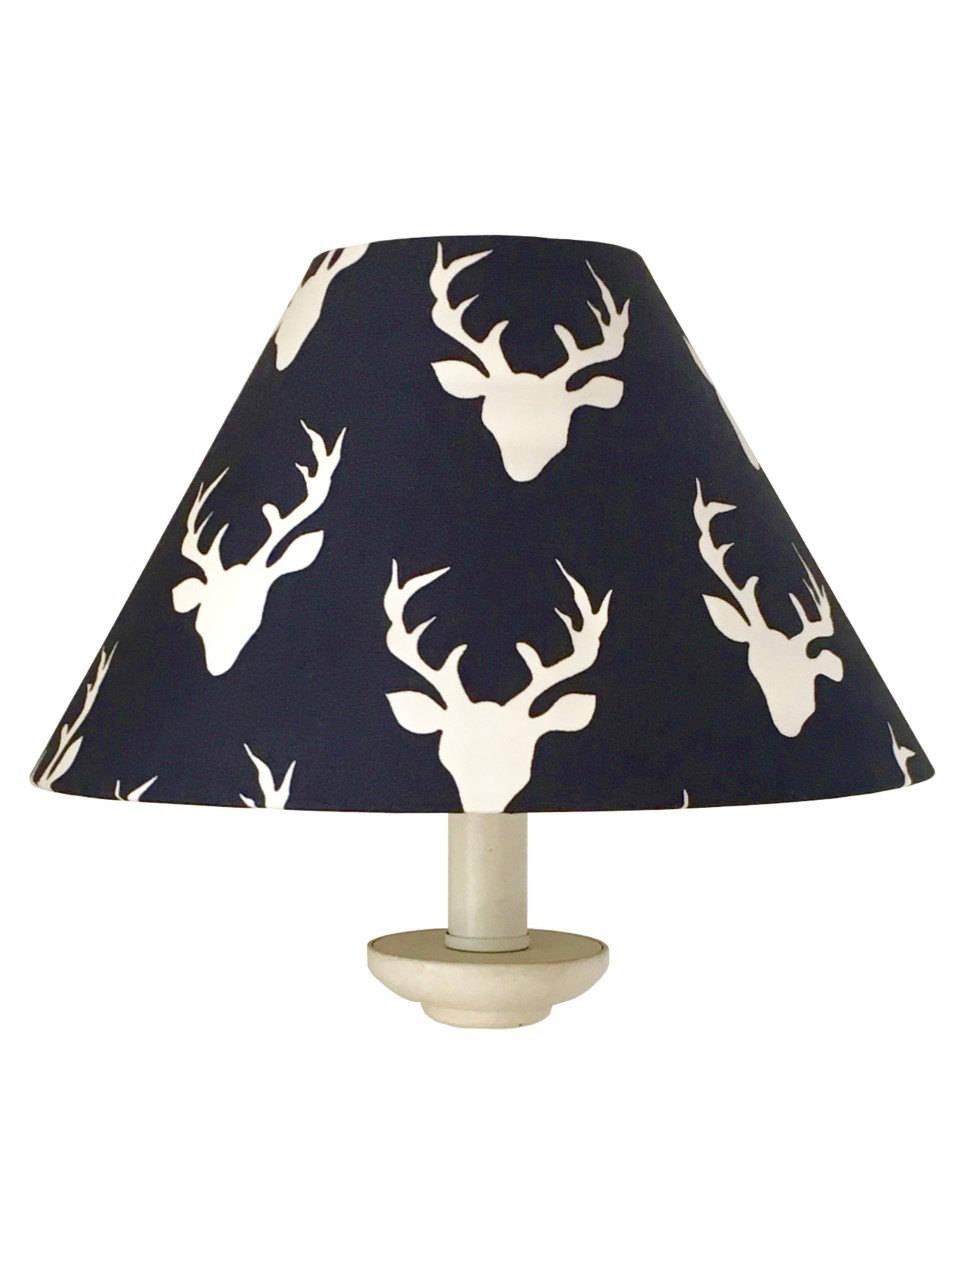 Woodland Deer Lamp Shade Boy Nursery Lamp Navy Lampshade Nursery